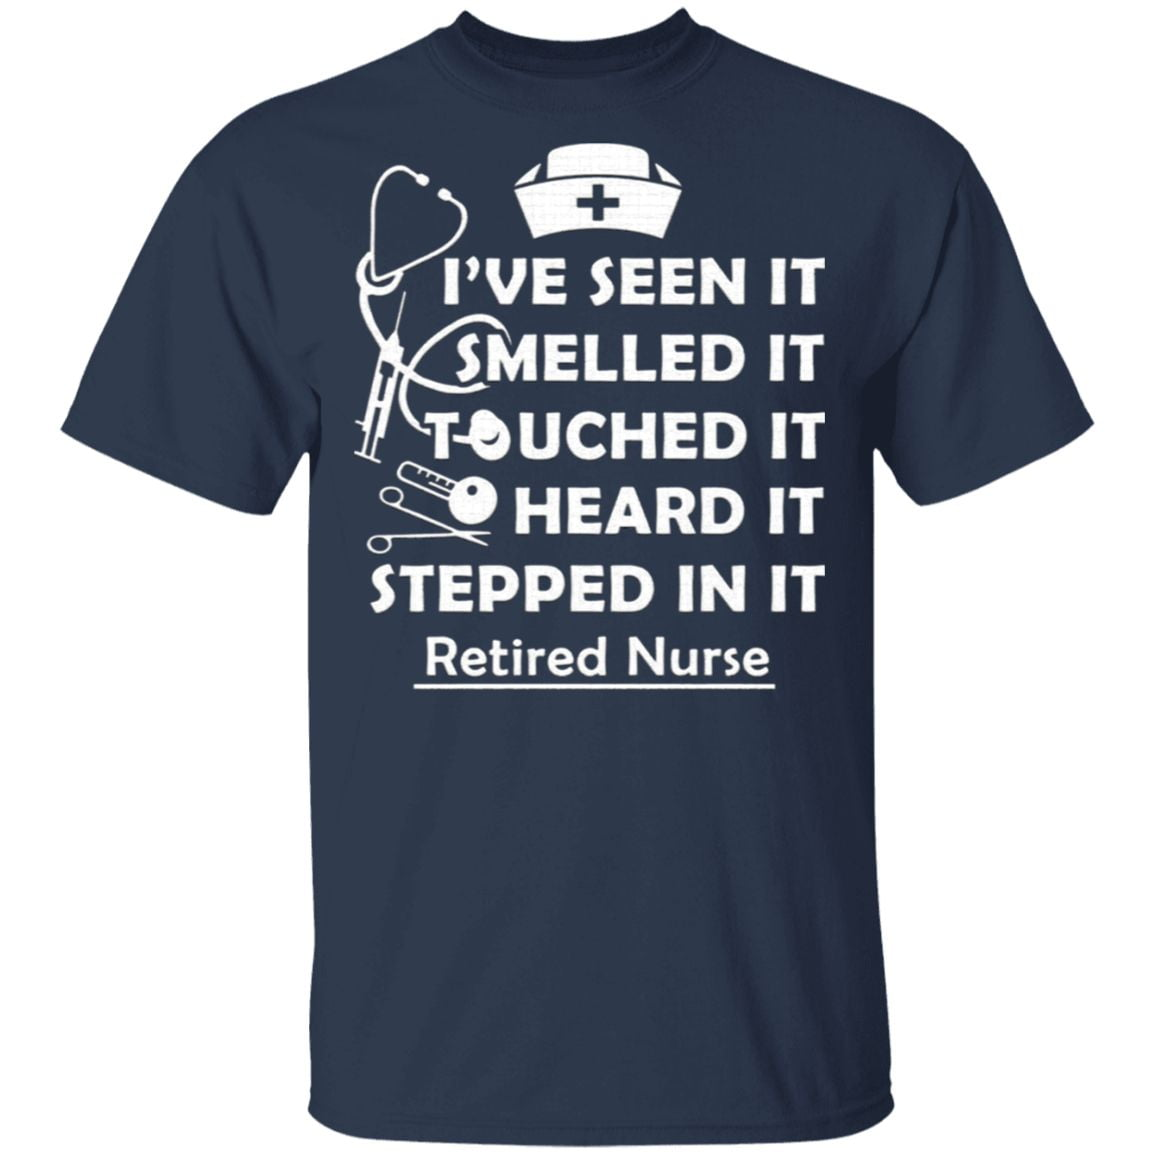 I've Seen It Smelled It Touched It Heard It Stepped in It Retired Nurse T-Shirt